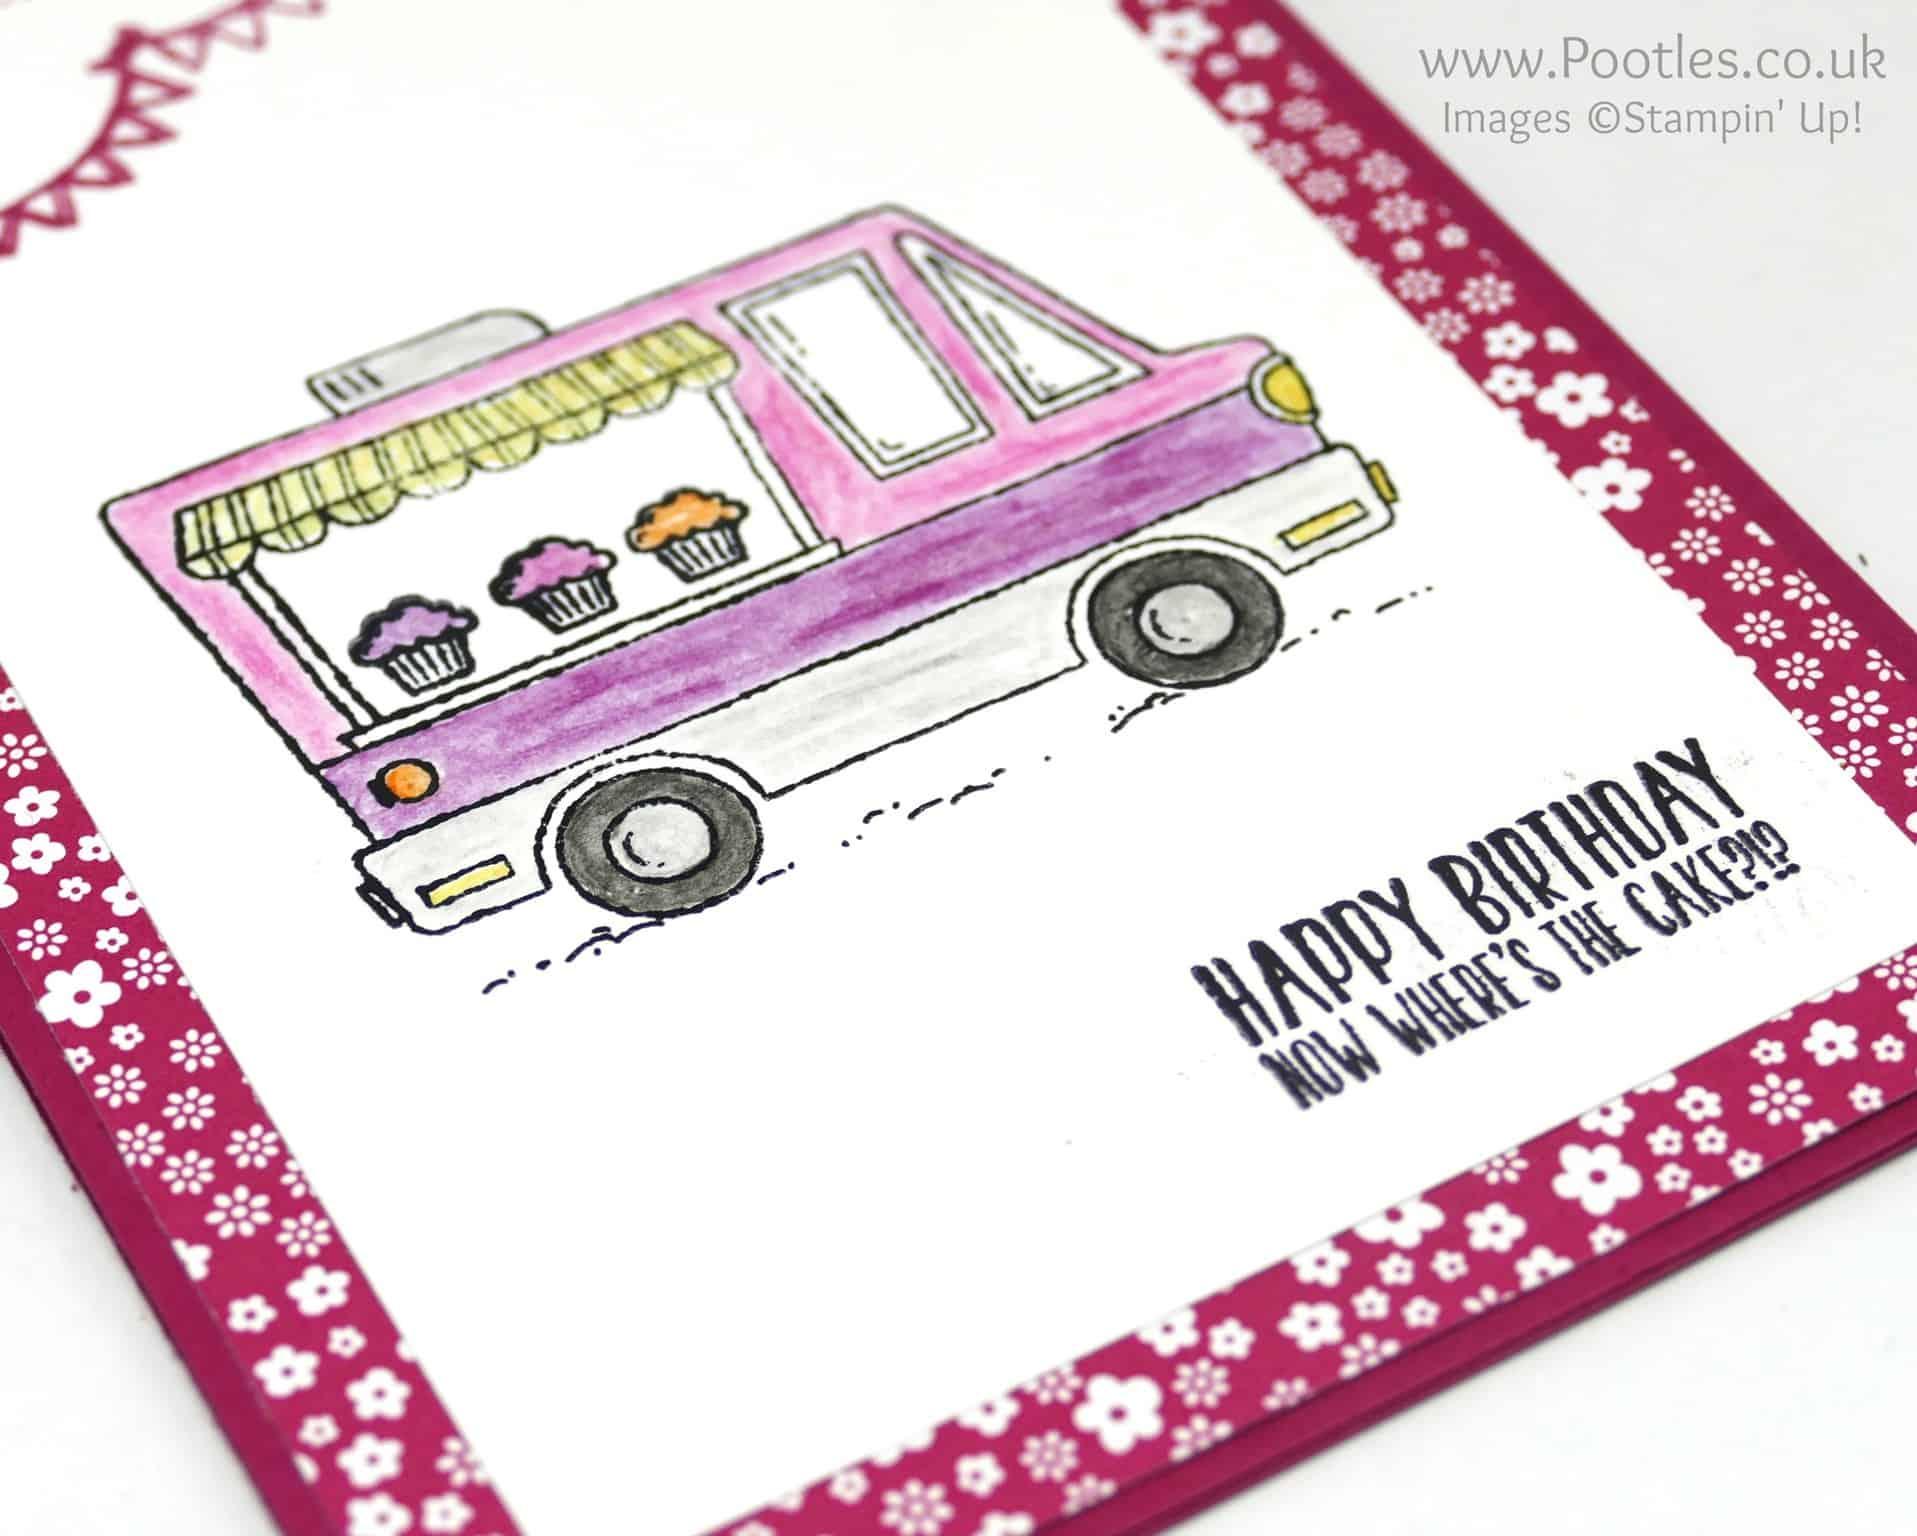 Tasty Pink Ice Cream Trucks in January….